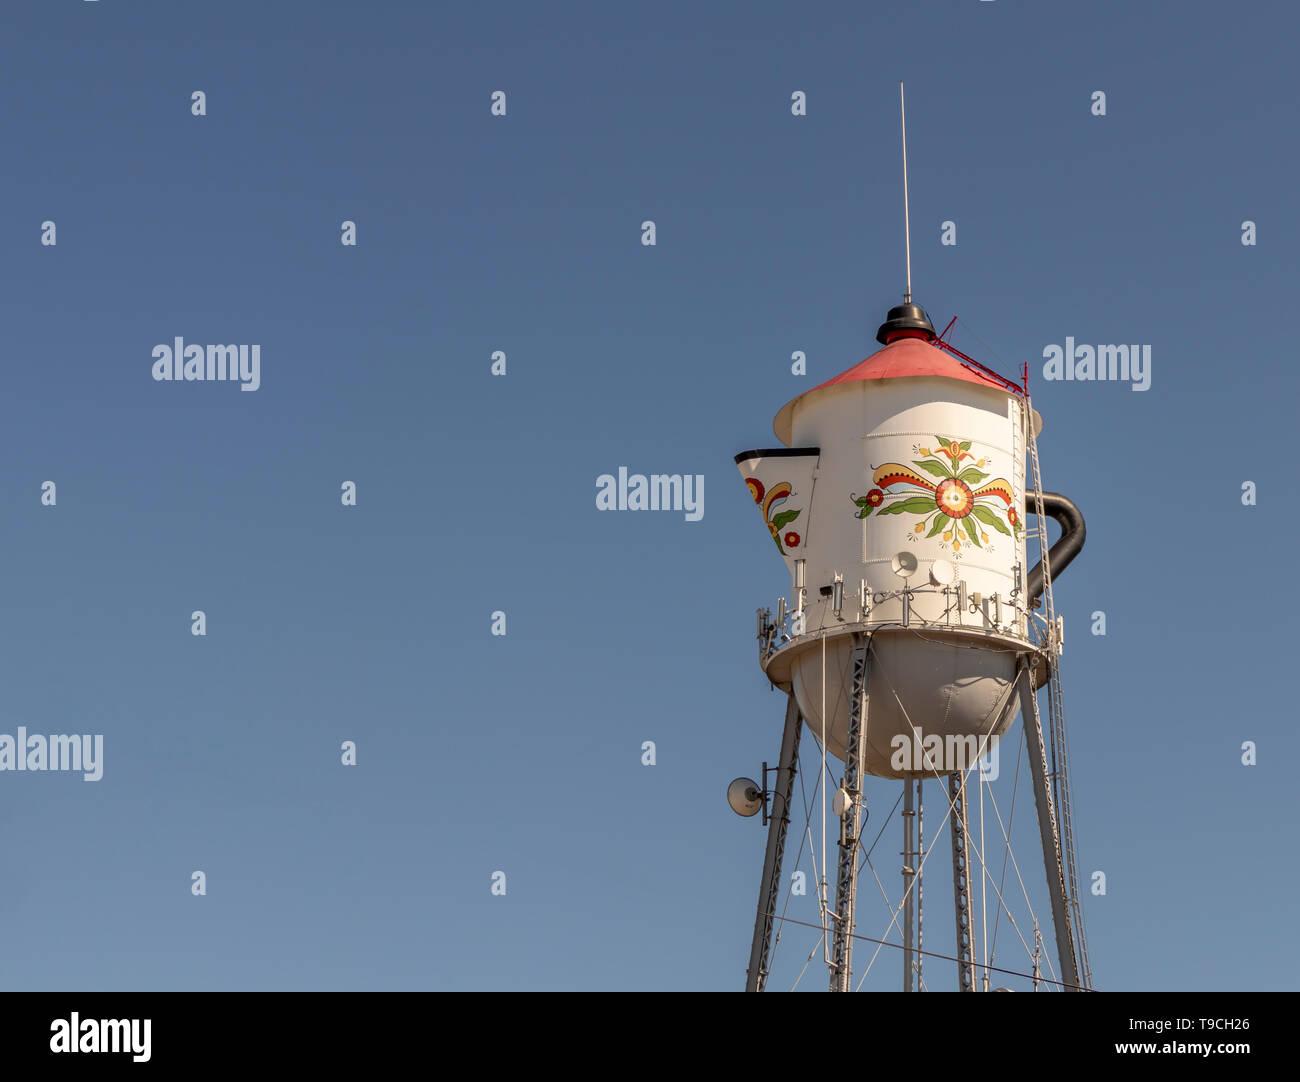 Water Tower designed to look like a Swedish Coffee Pot. Kingsburg, Fresno County, California, USA. - Stock Image